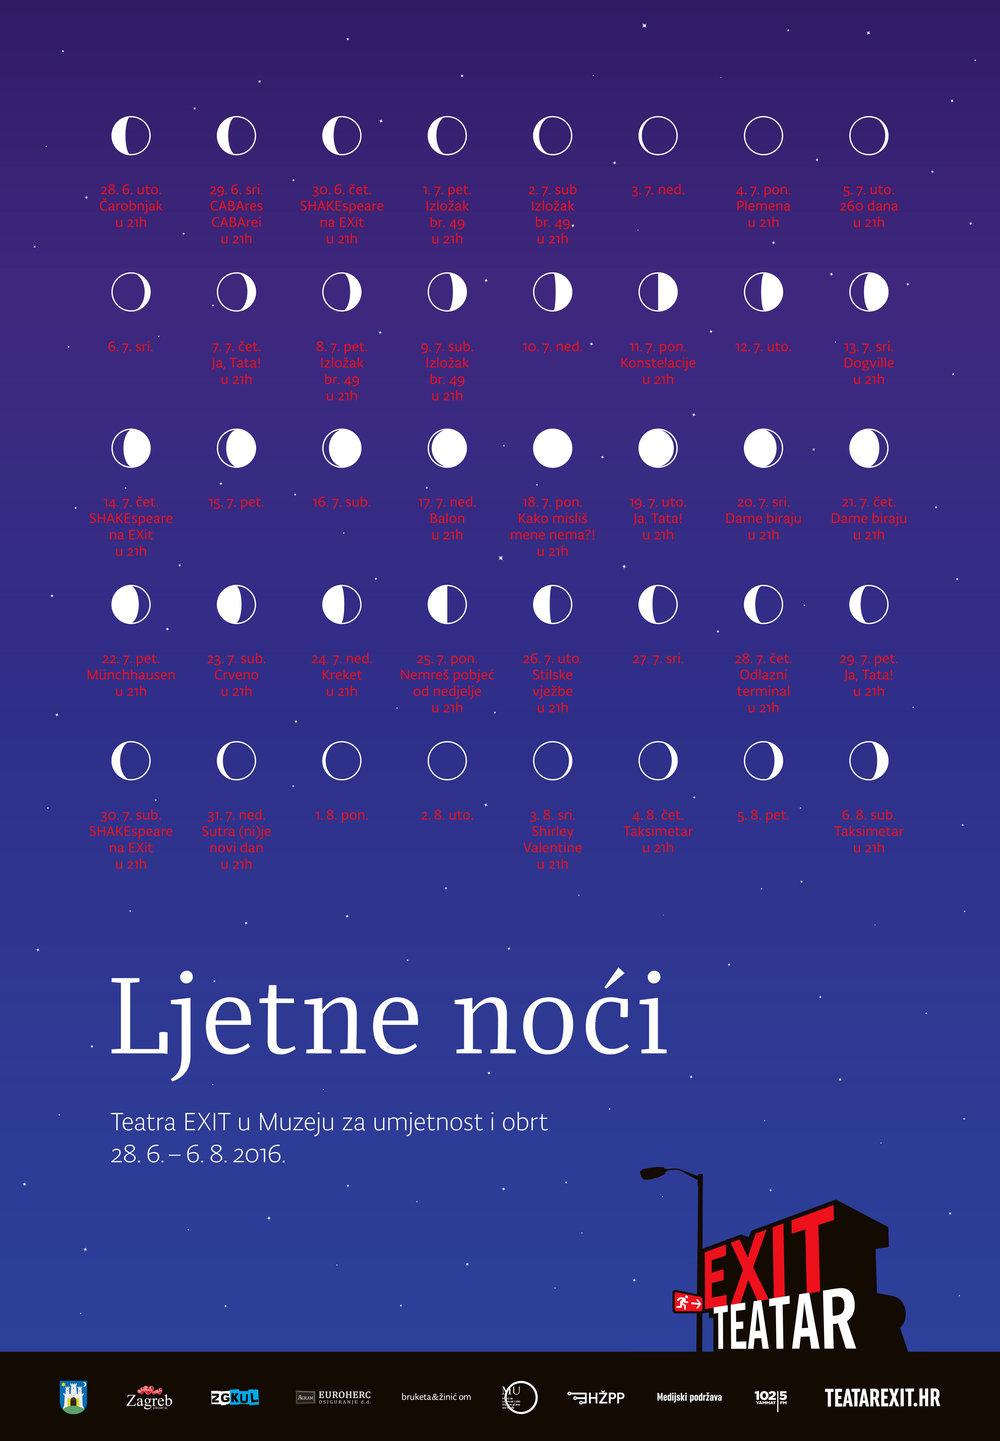 201606-Teatar Exit-11908-Ljetne noci Teatra EXIT u MUO-CL-B1 plakat_68x98.jpg